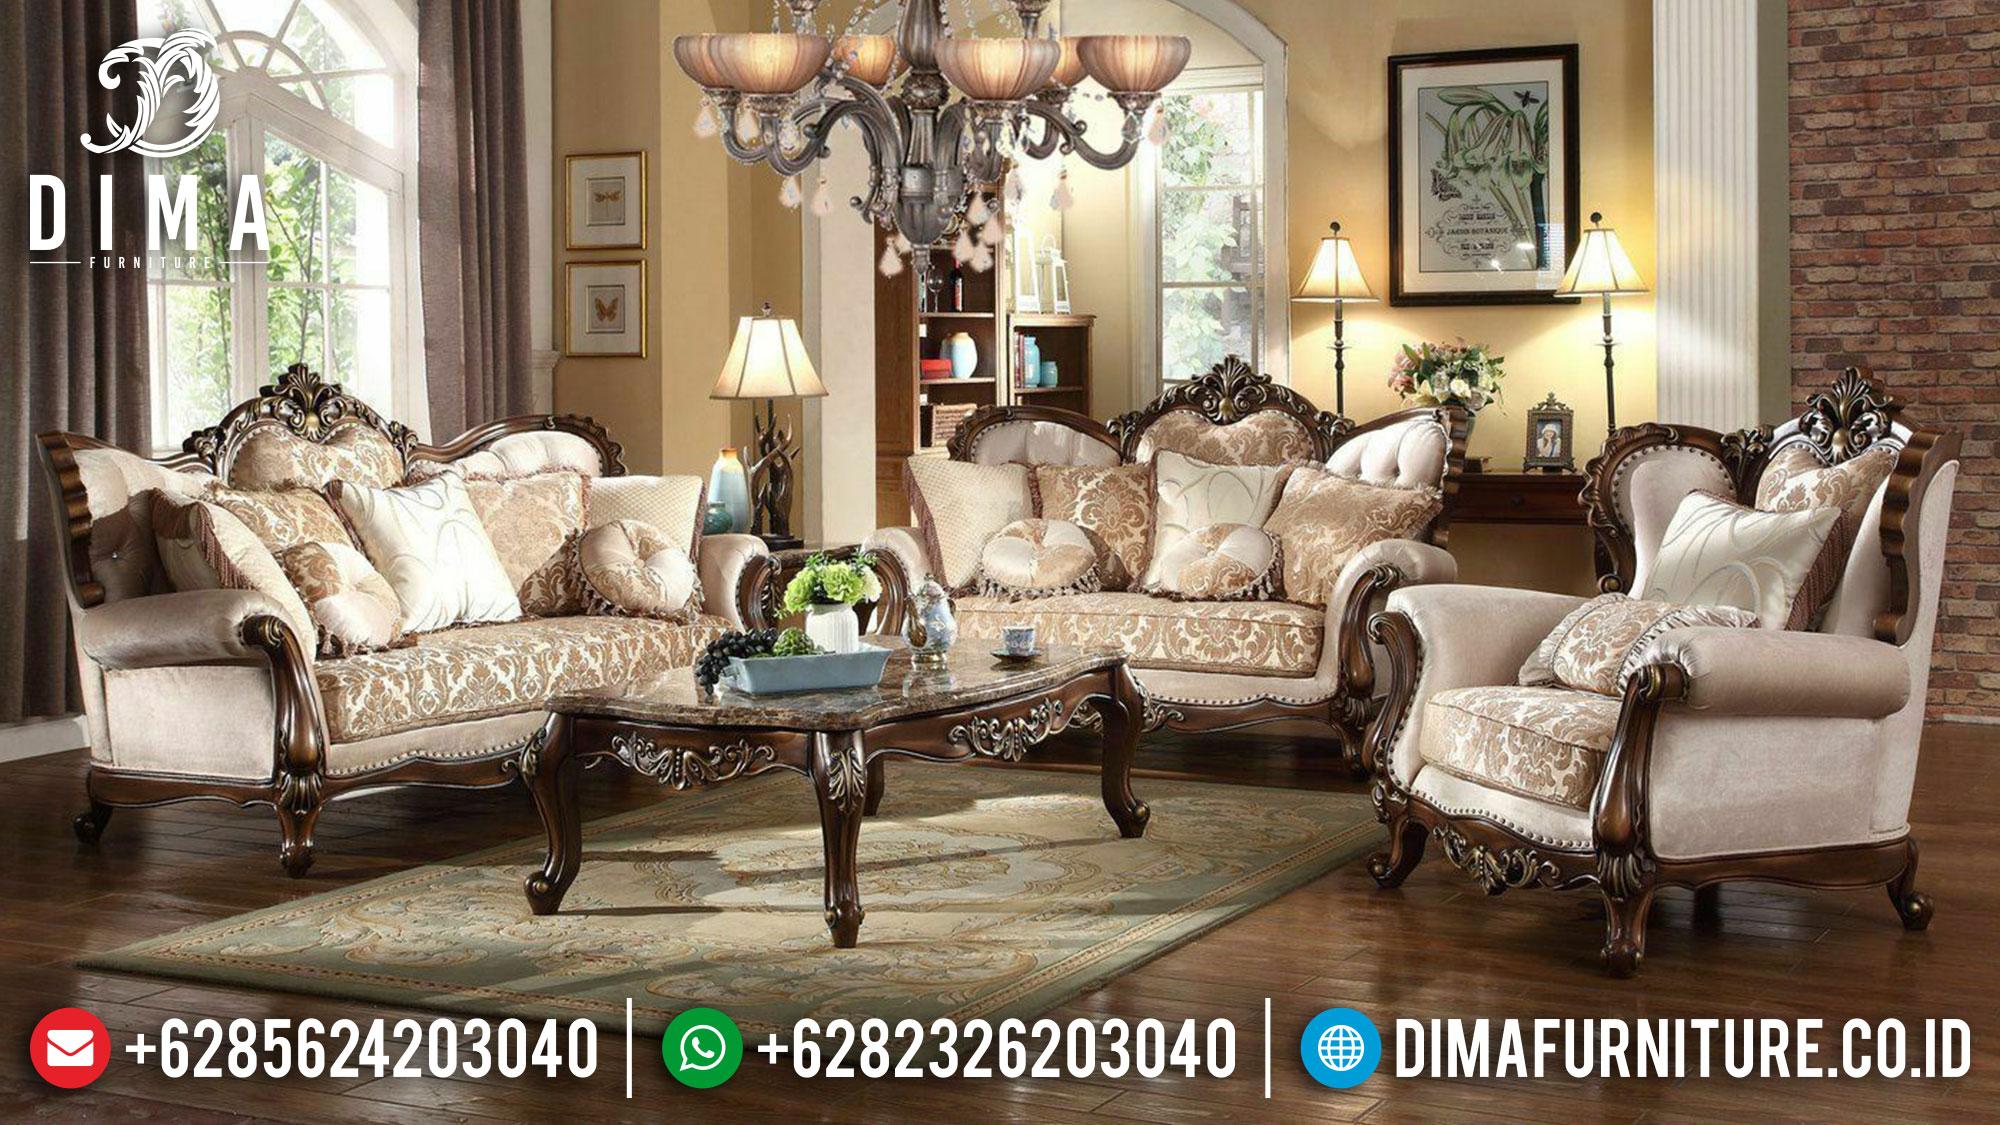 Iris Style Sofa Ruang Tamu Mewah Classic Luxury Furniture Jepara ST-1282